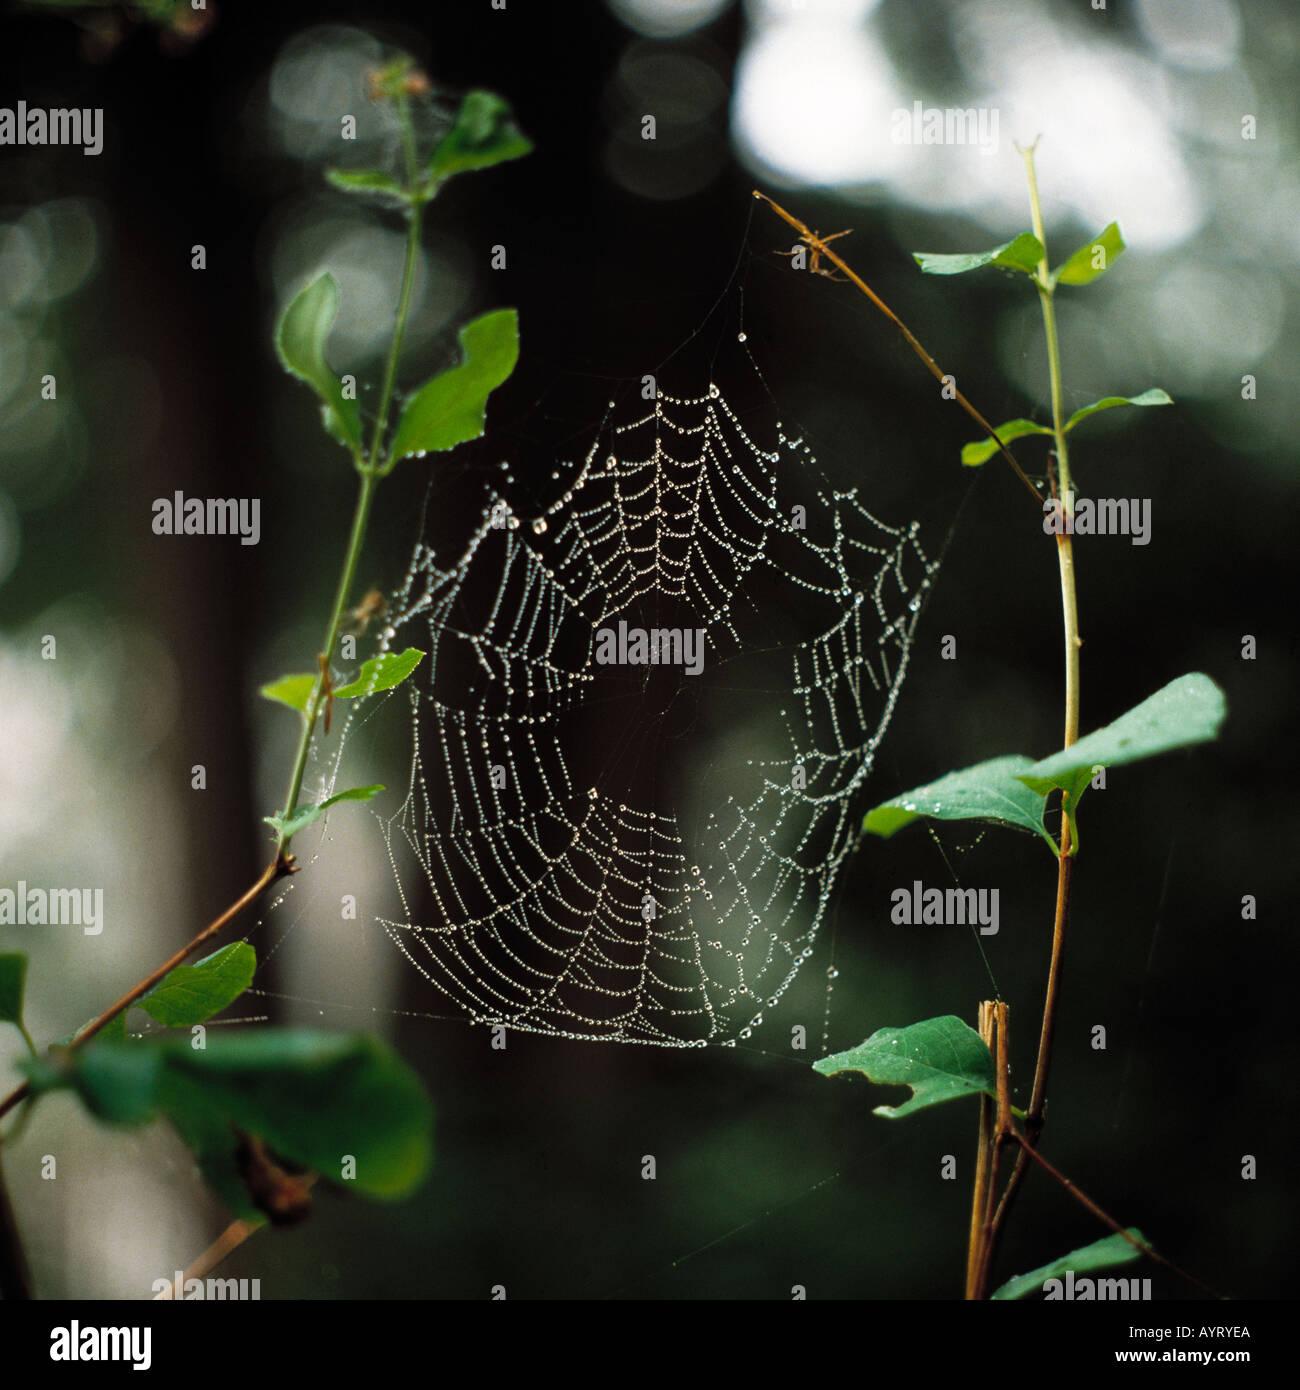 animal, animals, animal world, spiders web, cobweb - Stock Image